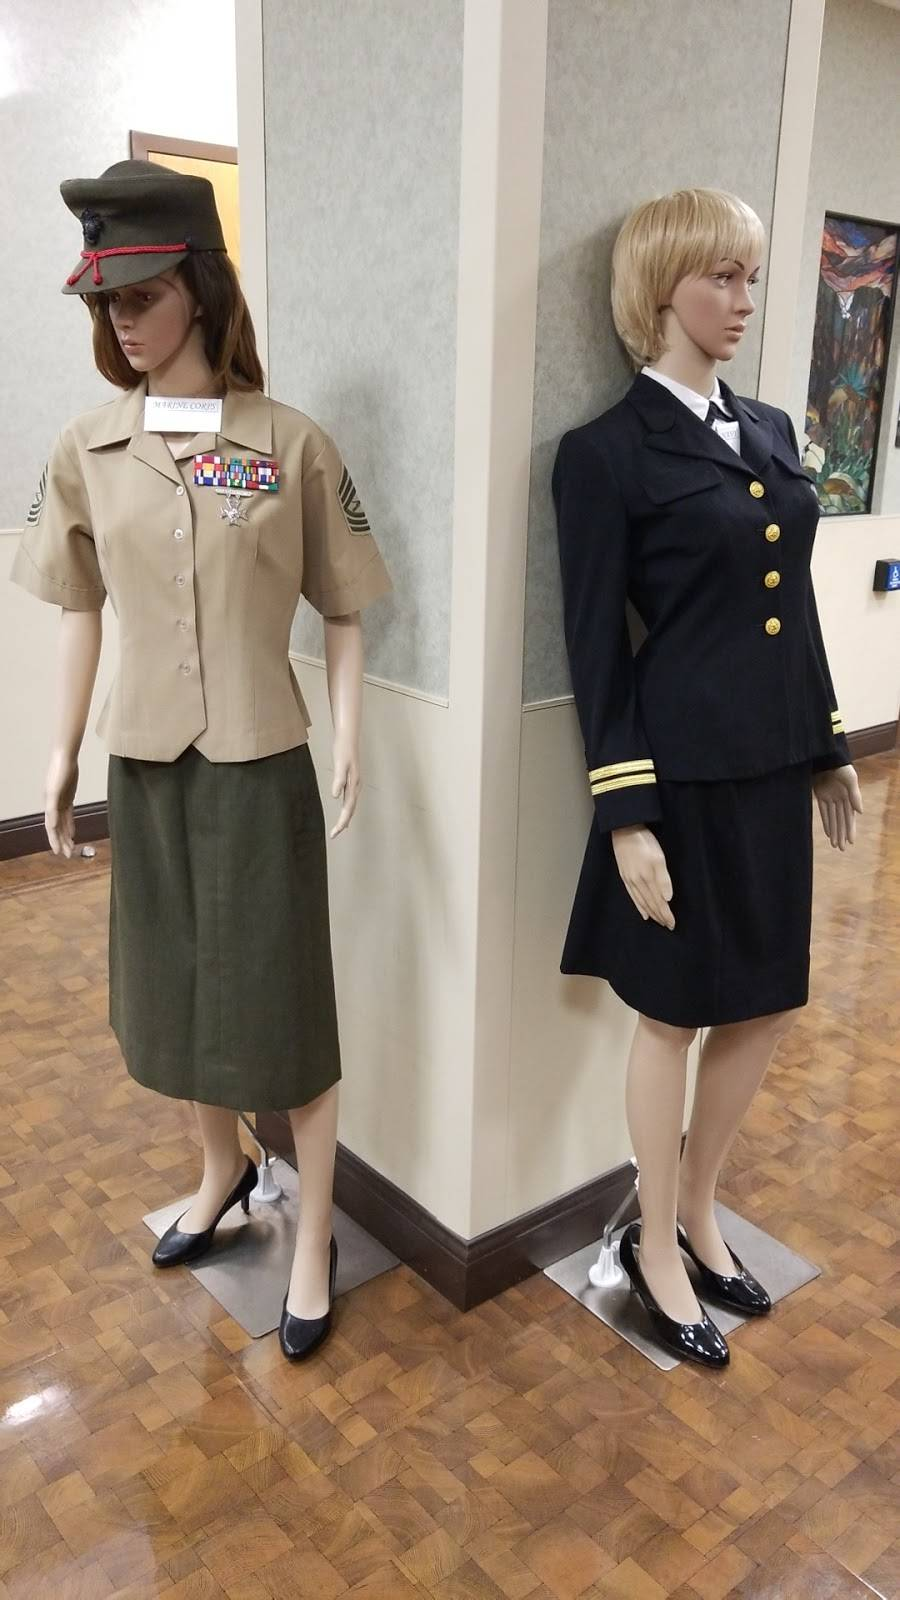 Veterans Hospital - hospital  | Photo 2 of 5 | Address: 3601 S 6th Ave, Tucson, AZ 85723, USA | Phone: (520) 792-1450